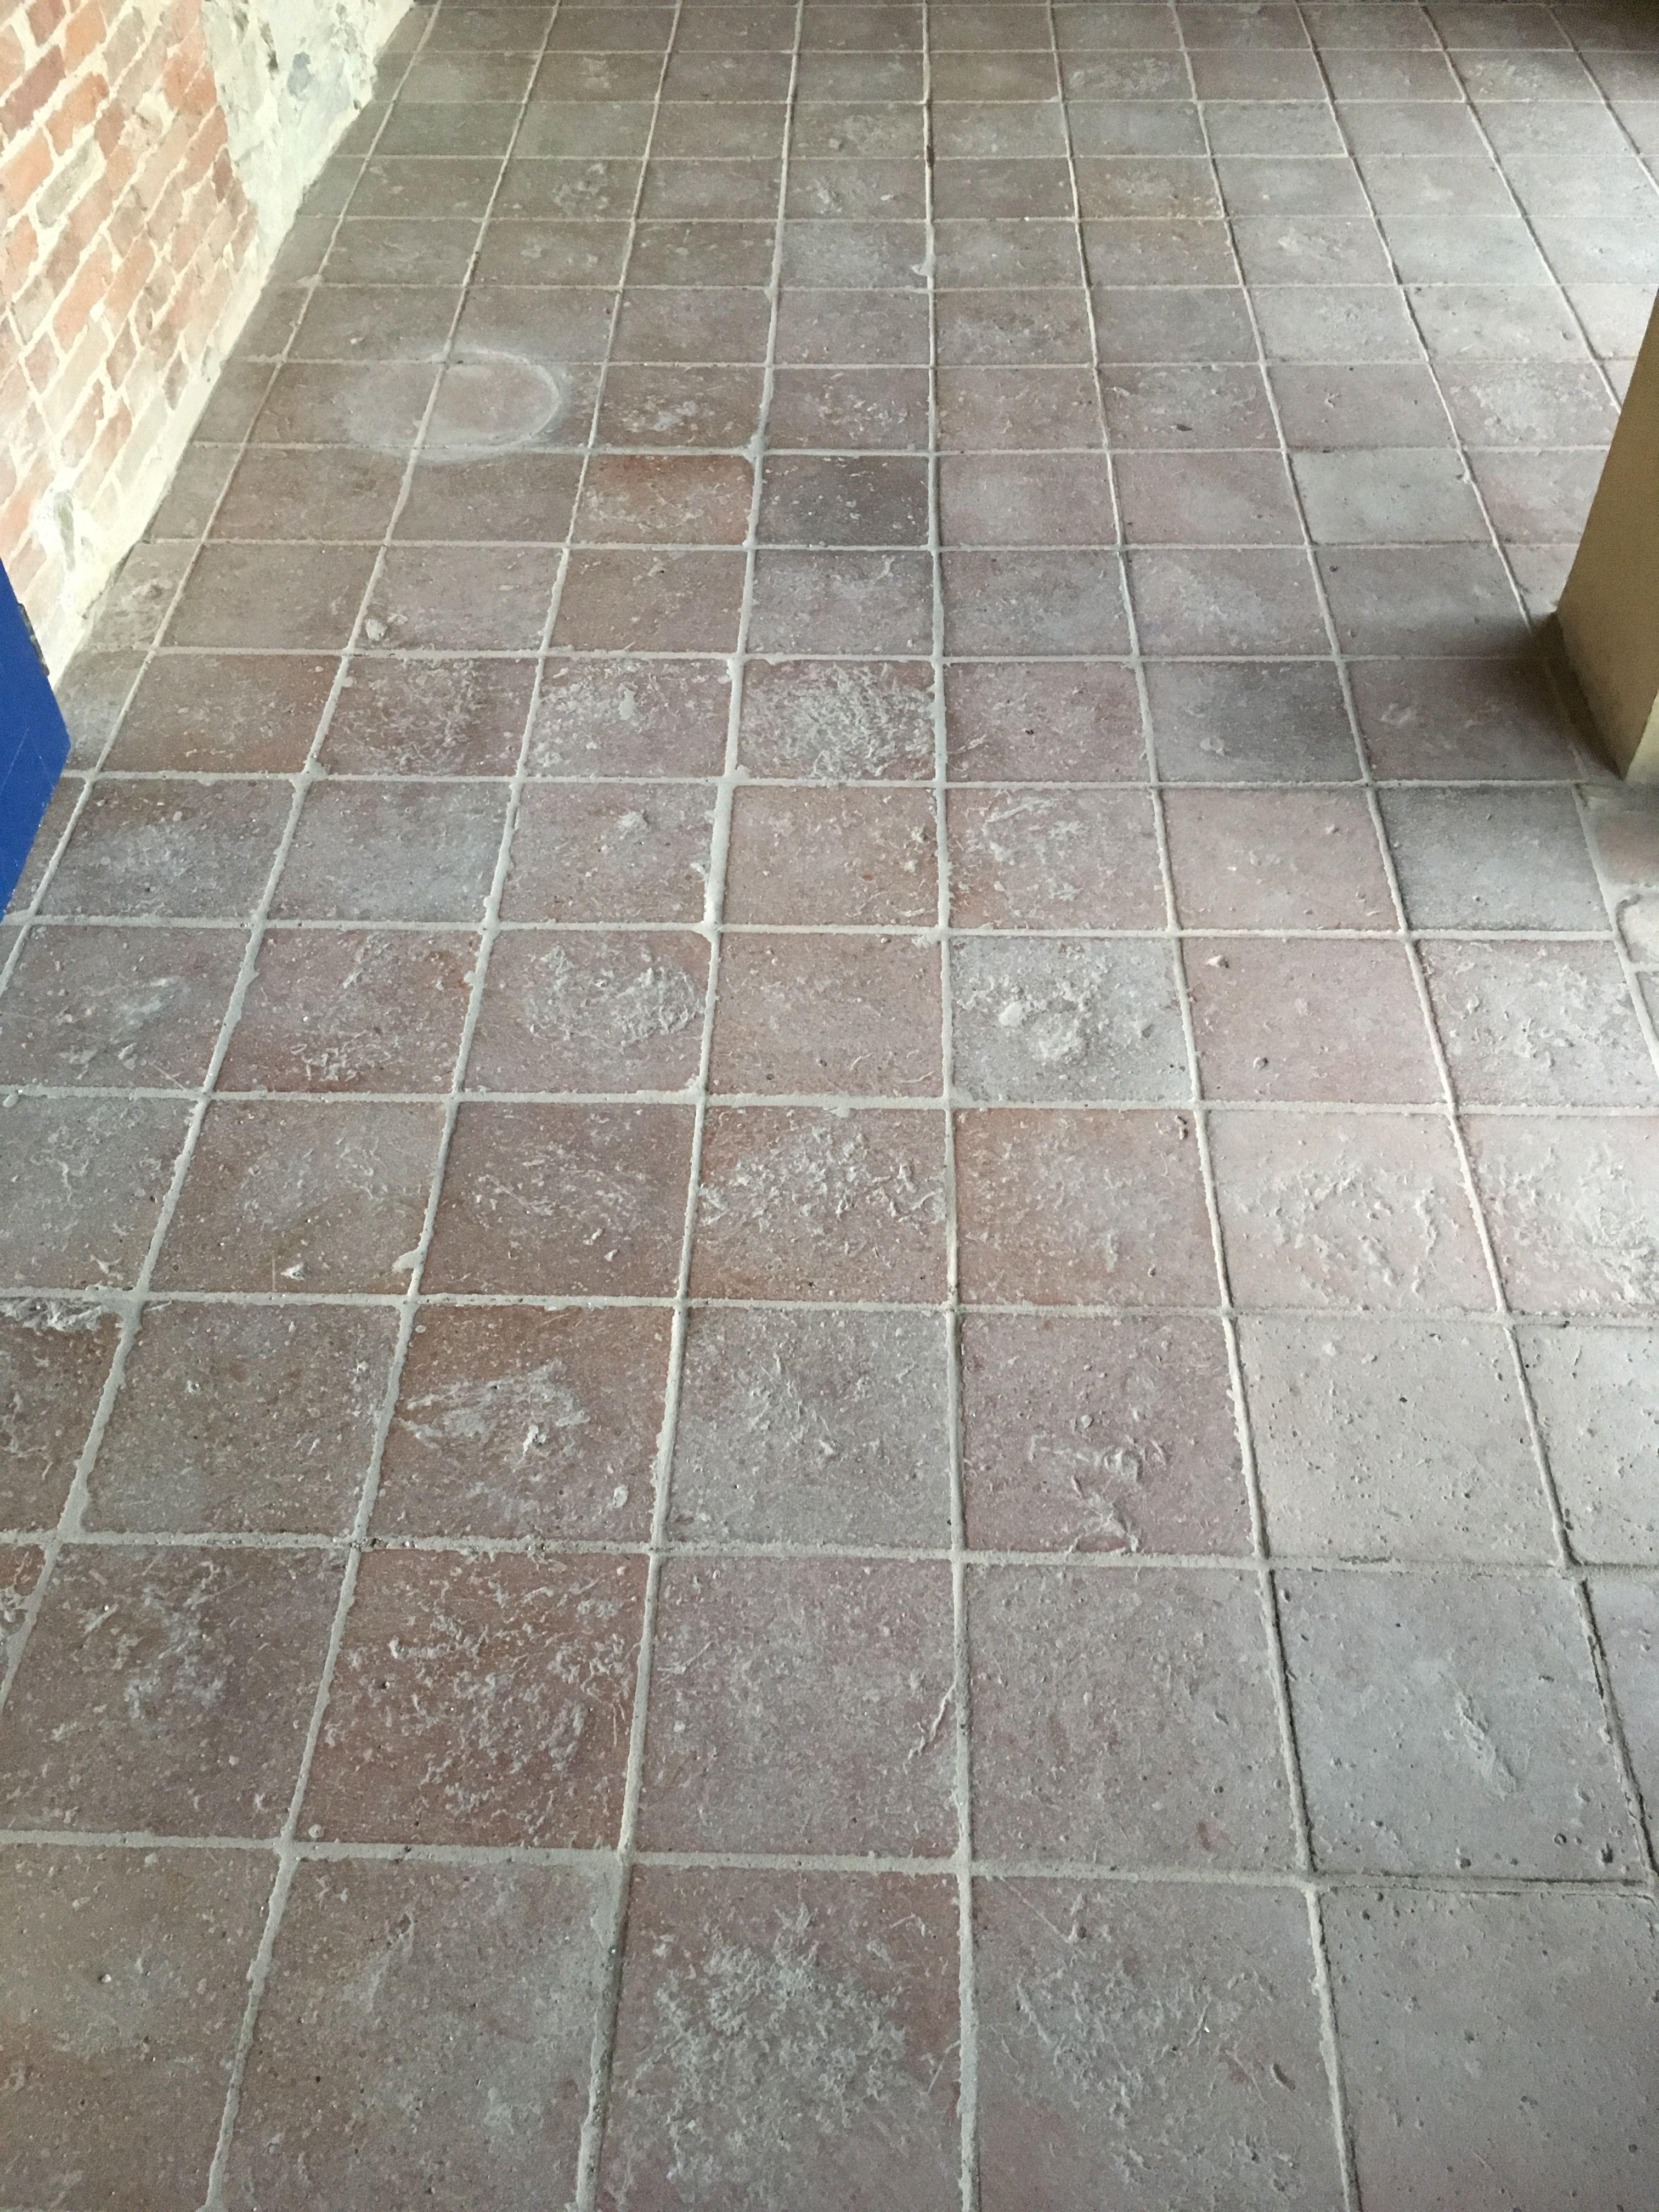 Pin By Sarah On Cr Floors Flooring Tiles Tile Floor